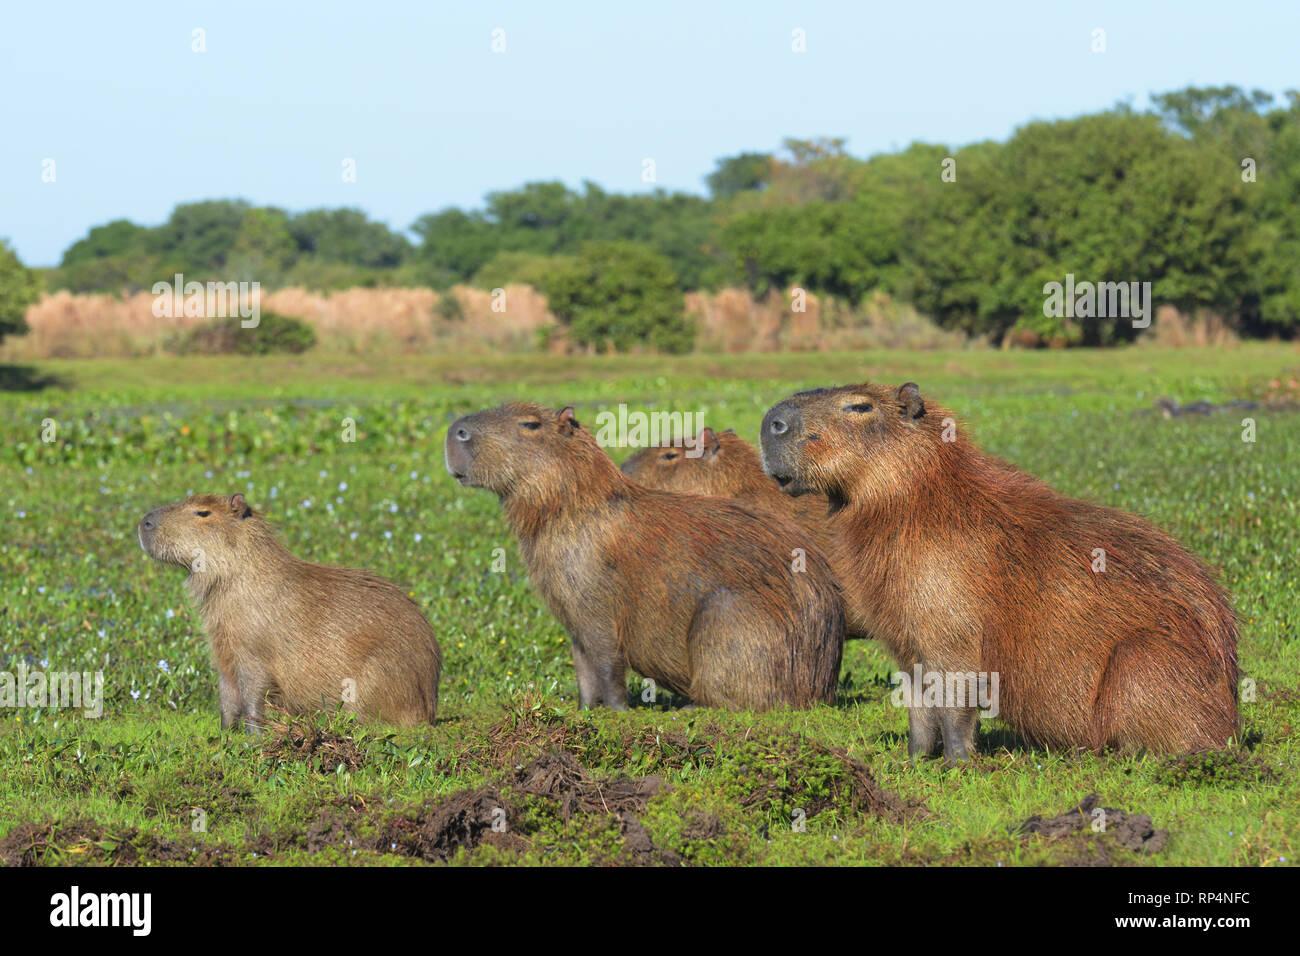 Family of Capybara (Hydrochoerus hydrochaeris) in the Pantanal Stock Photo